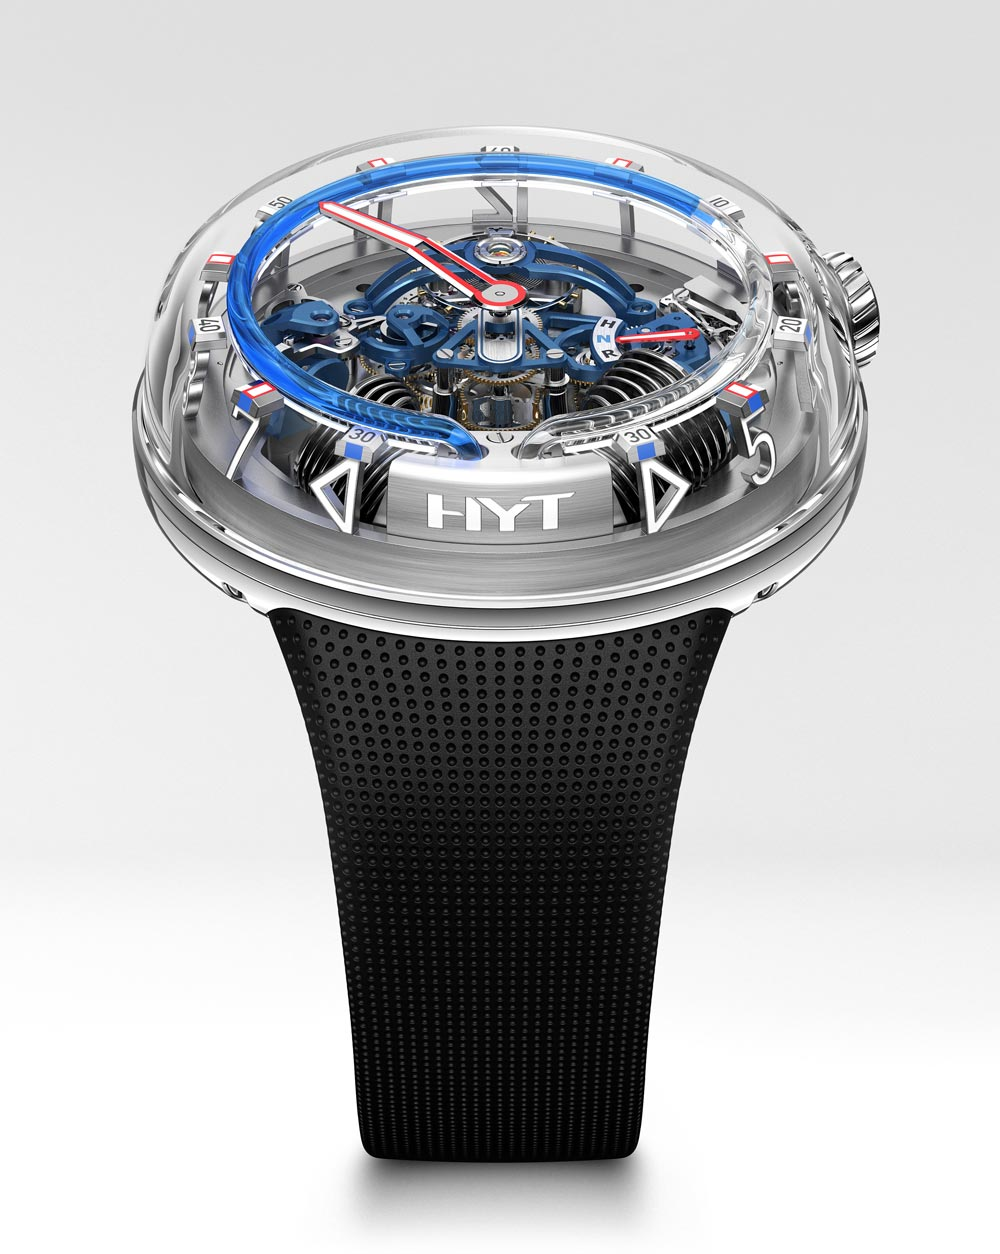 Reloj H20 de HYT ( The Hydro Mechanical Horologistic en color azul